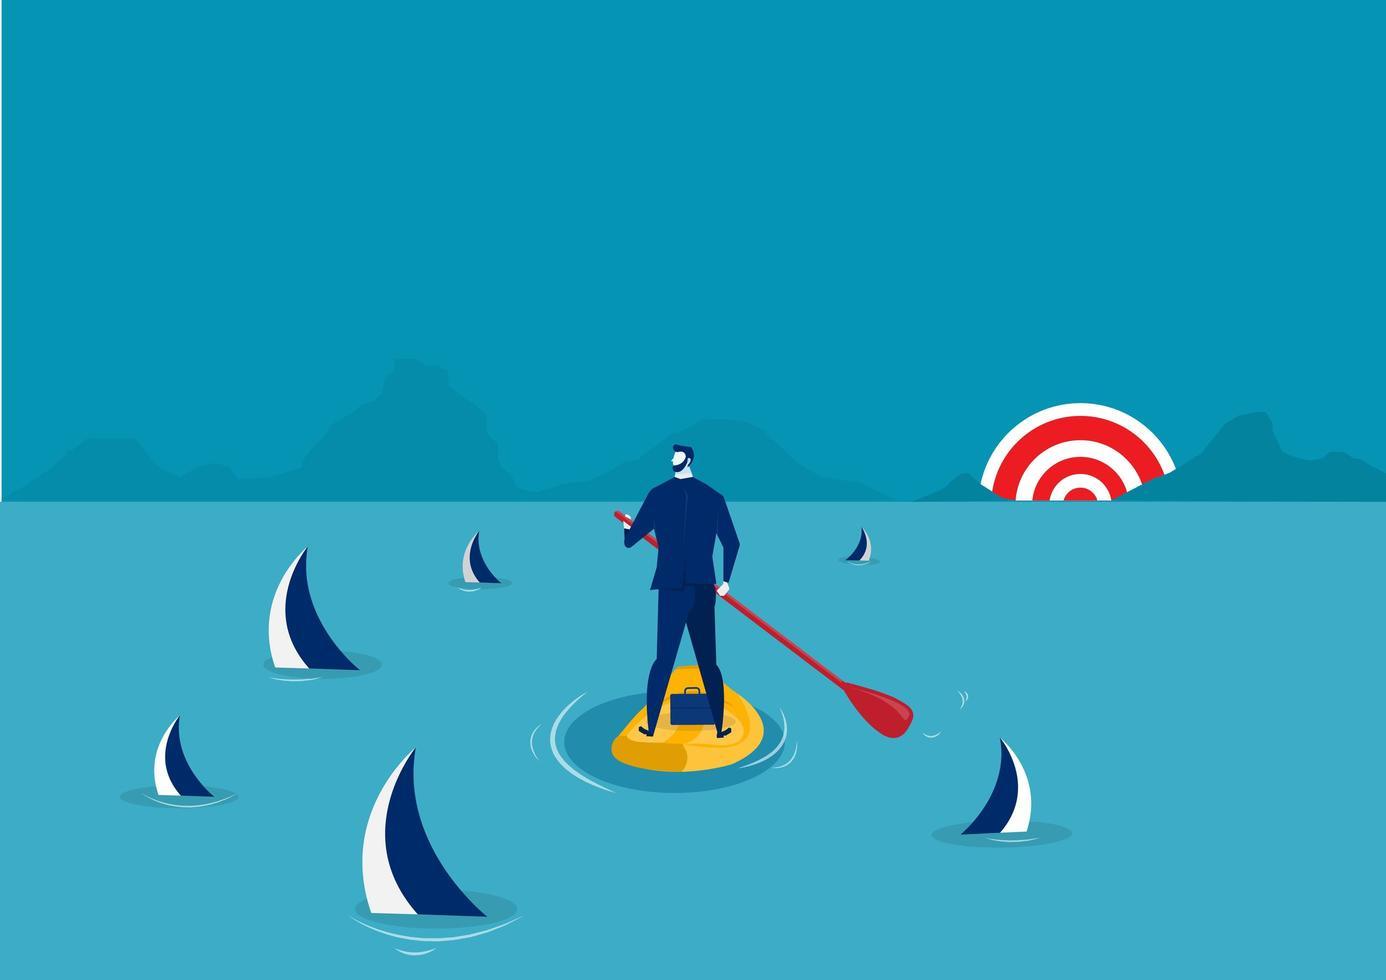 affärsman paddling ombord bland hajar vektor